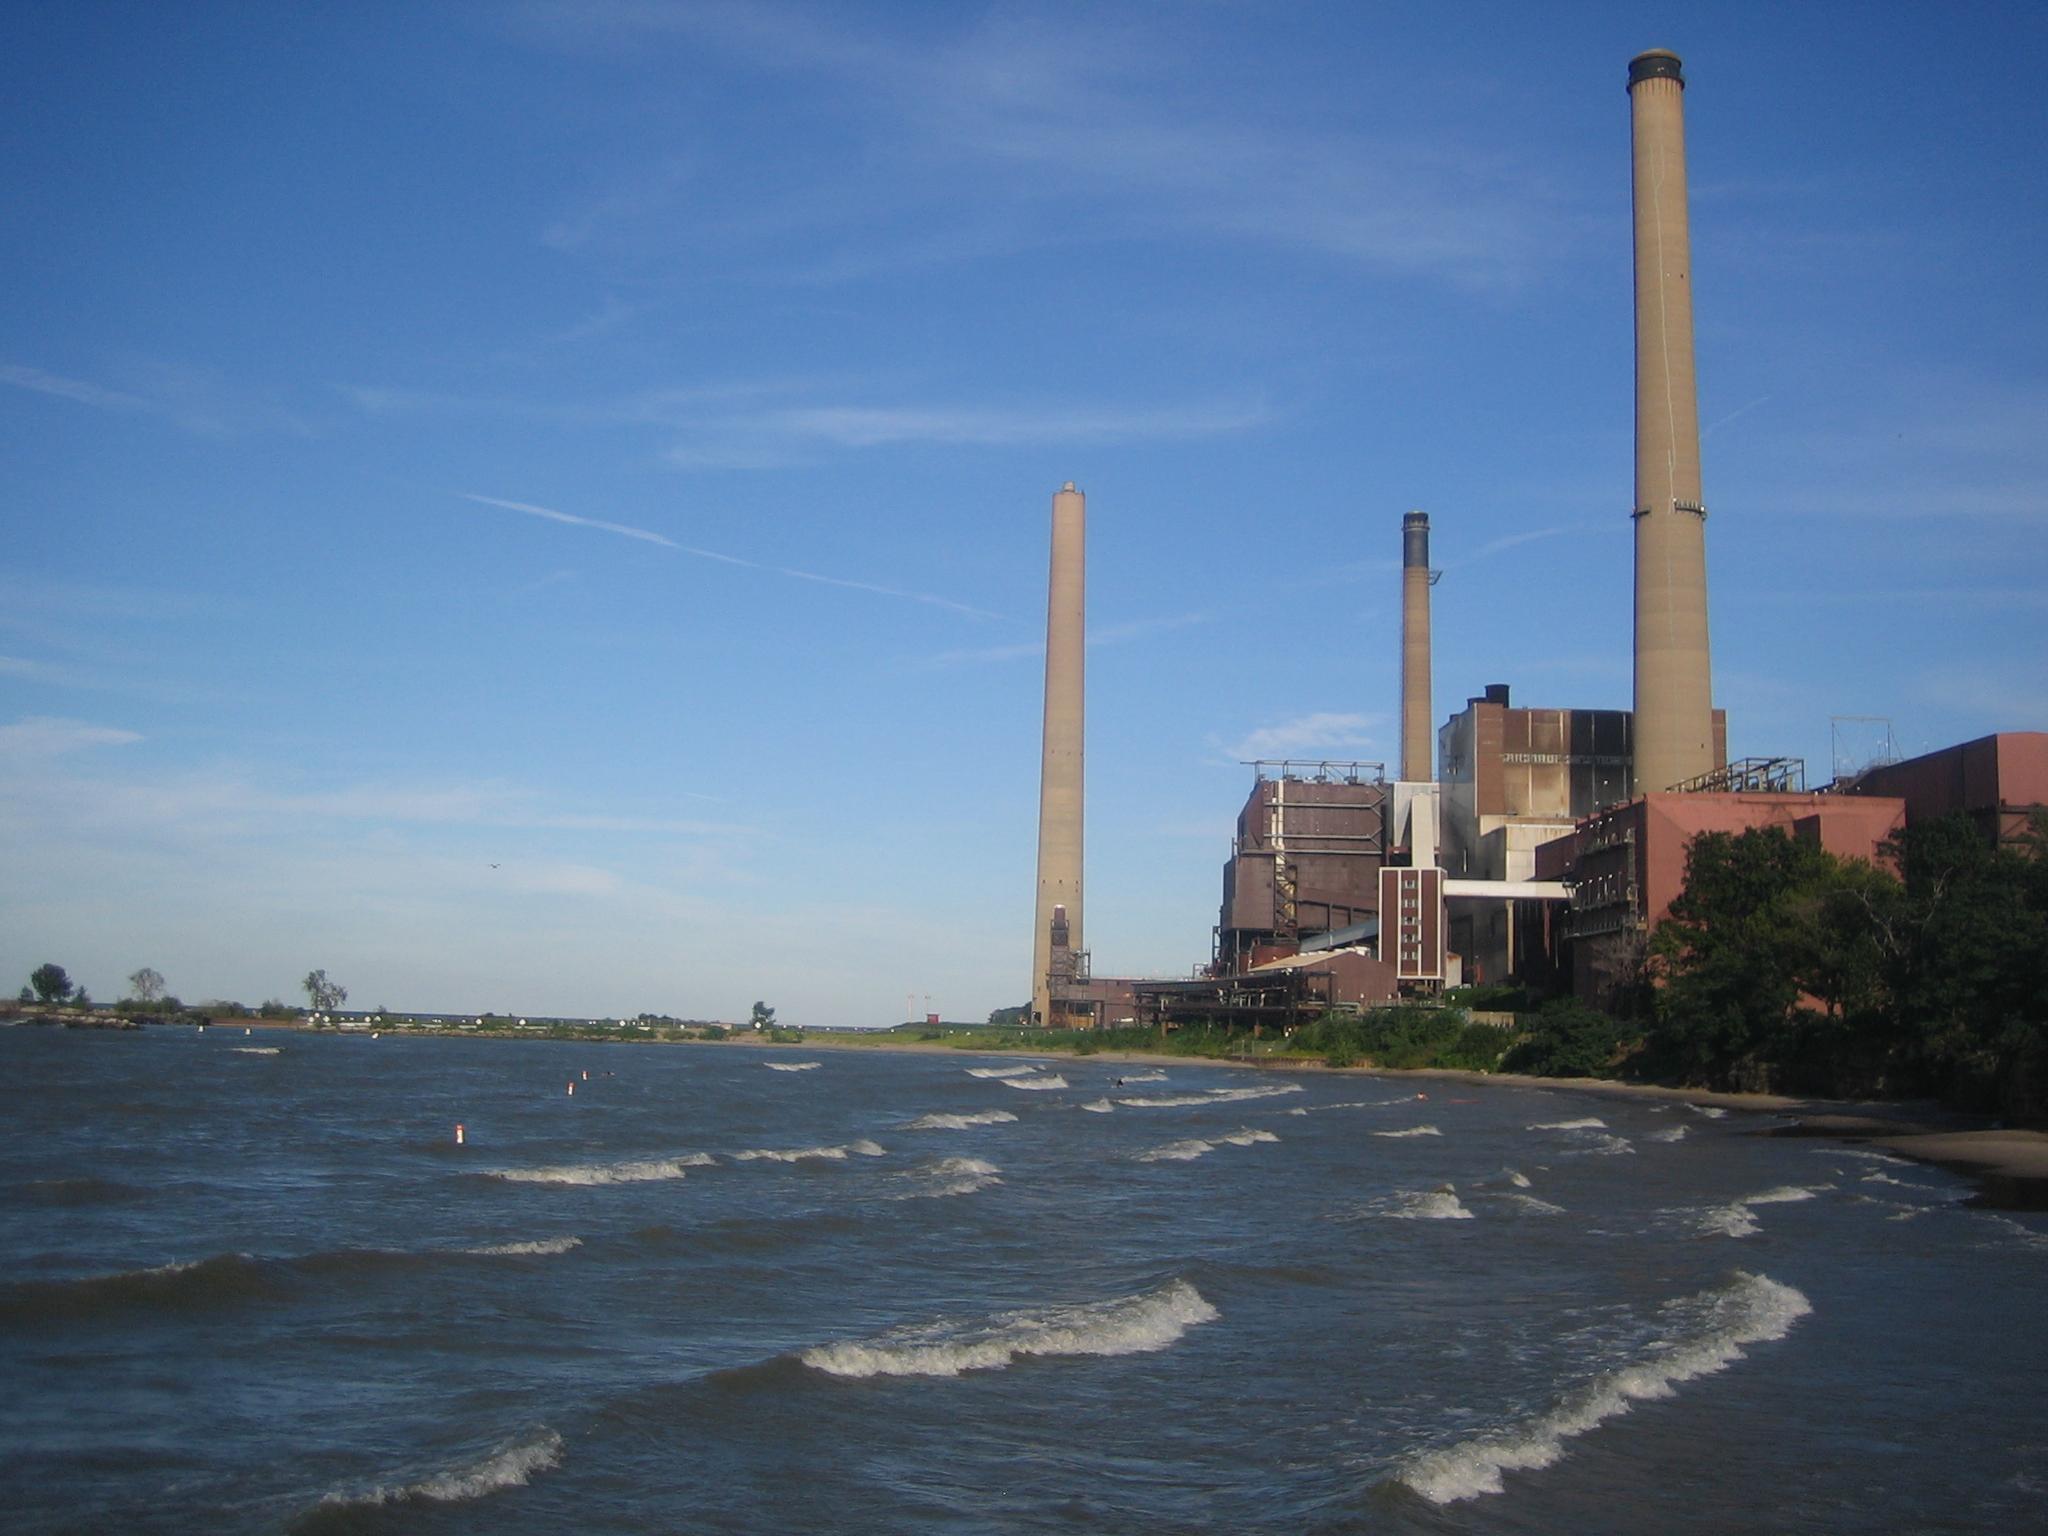 Description avon lake power plant